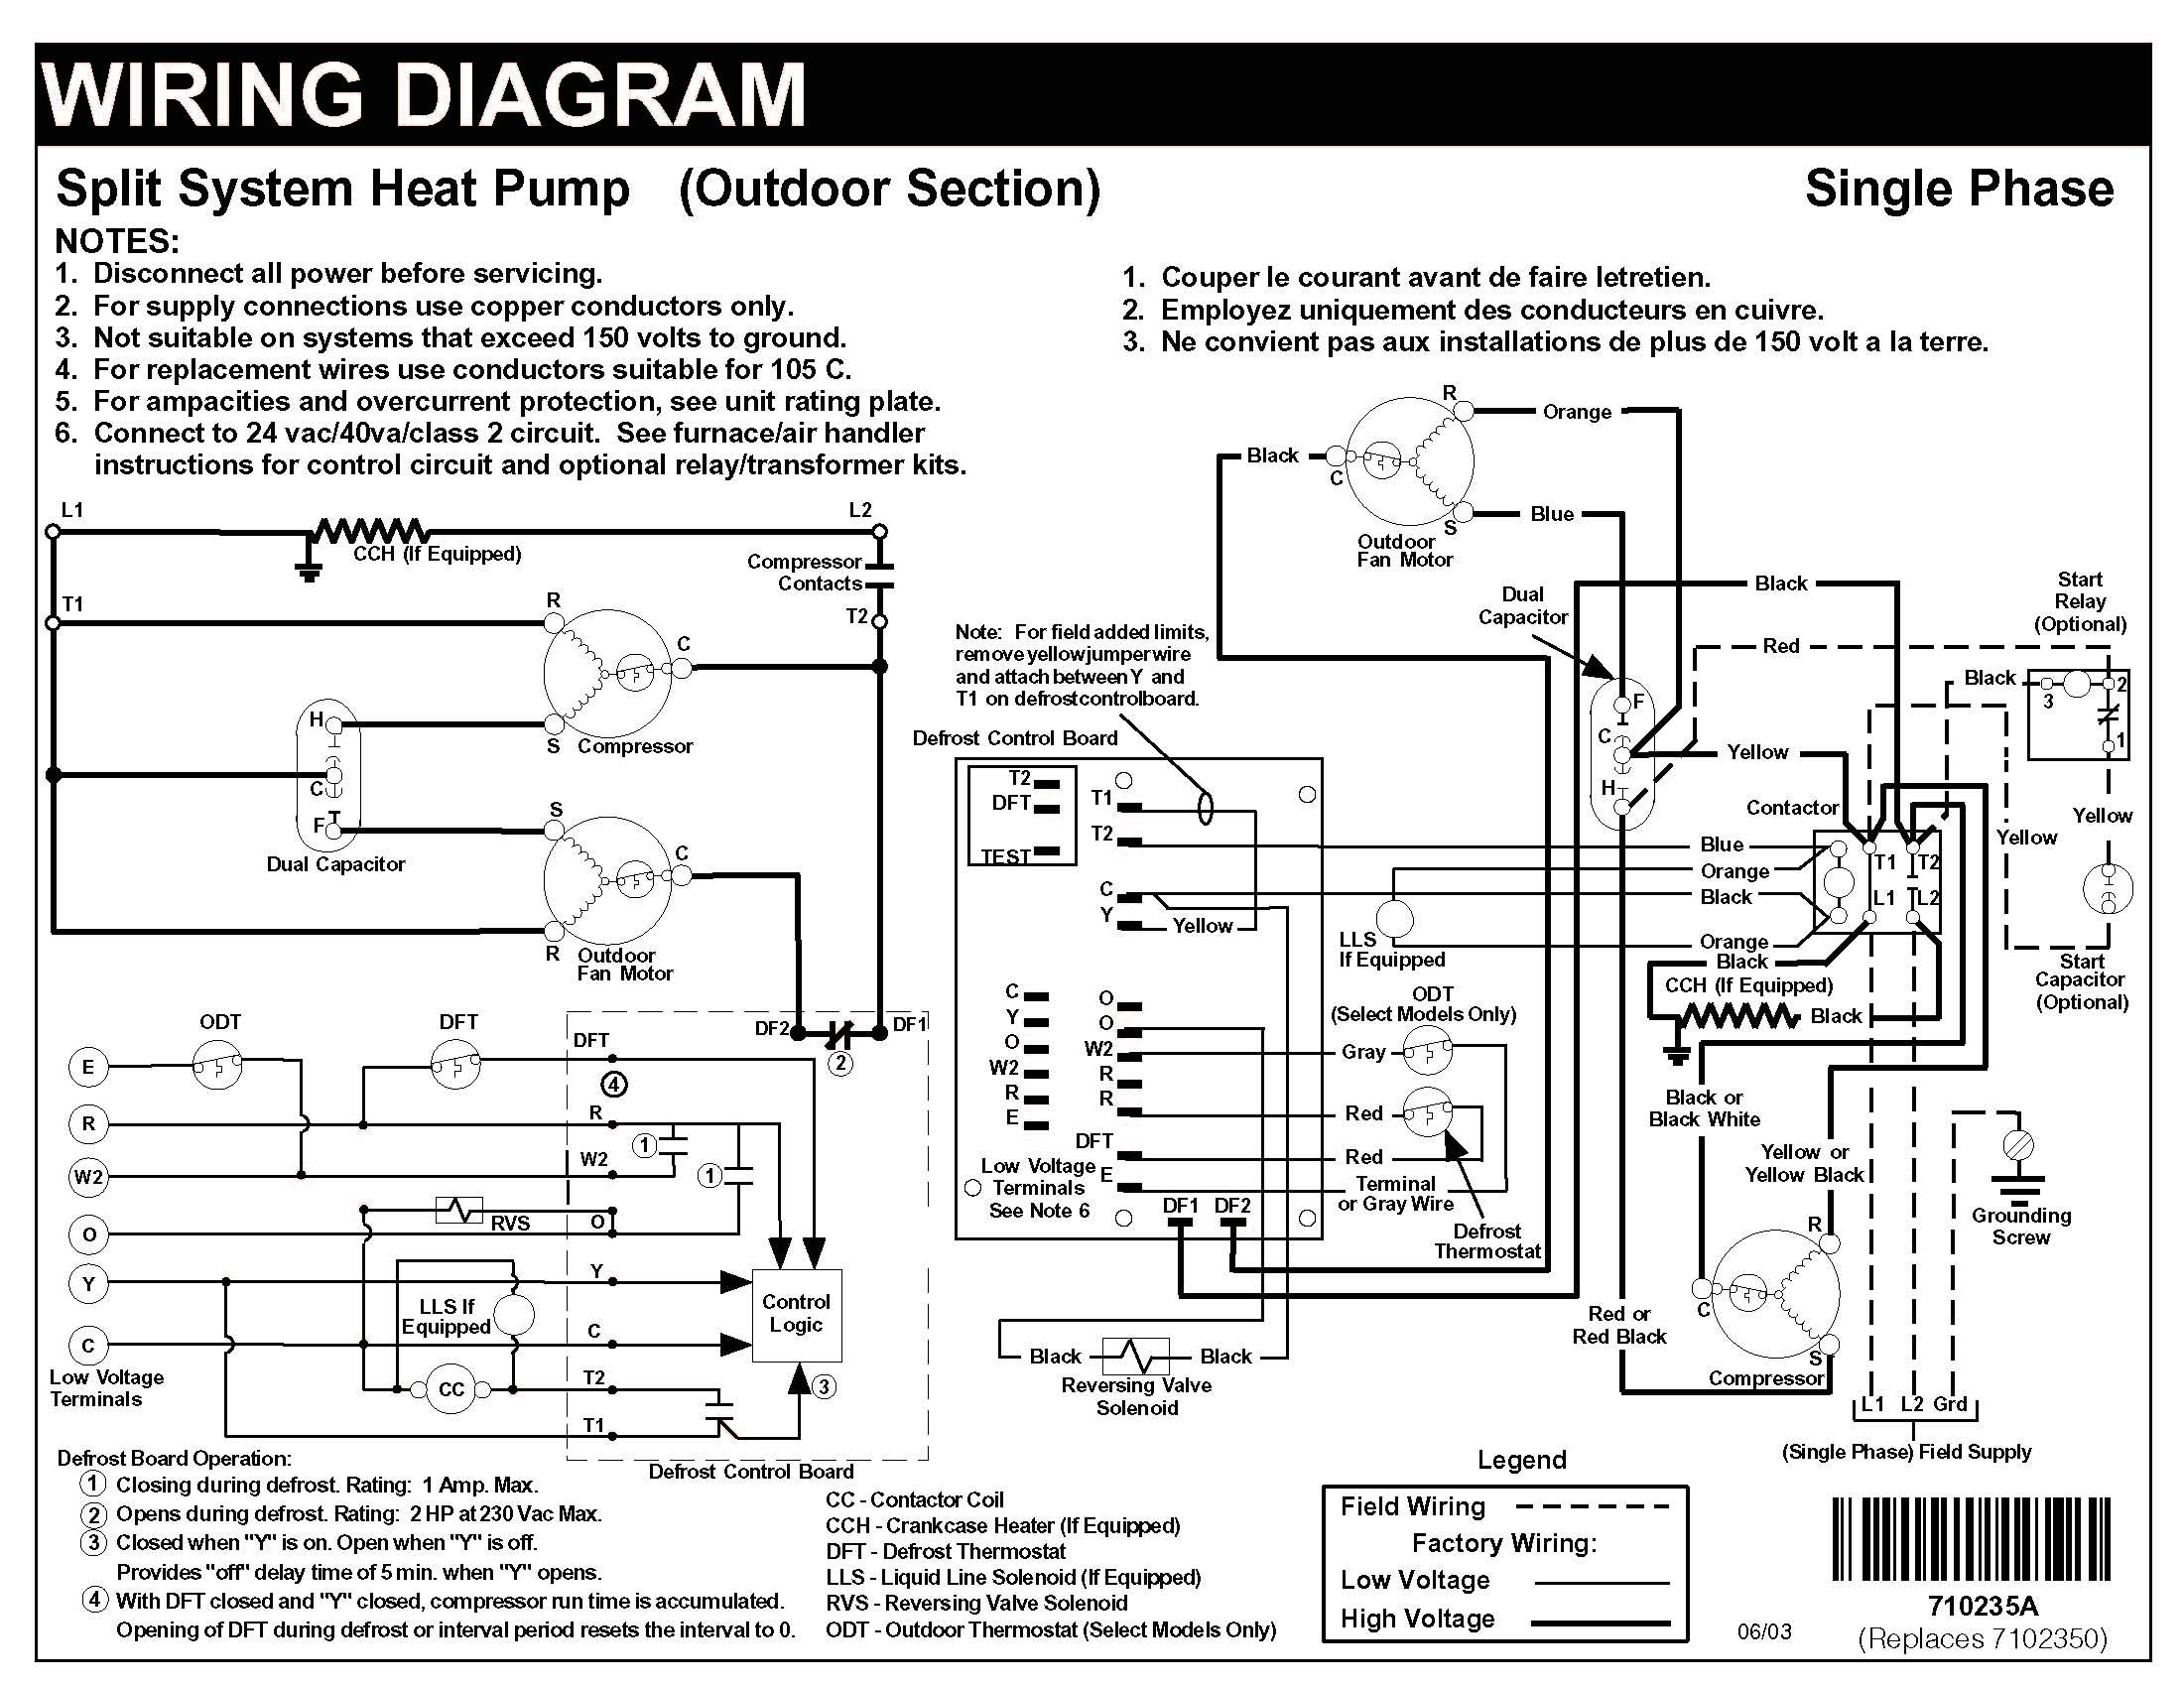 medium resolution of lennox heat pump diagram wiring diagrams scematic lennox cbx diagram heat pumps residential heat pumps heat